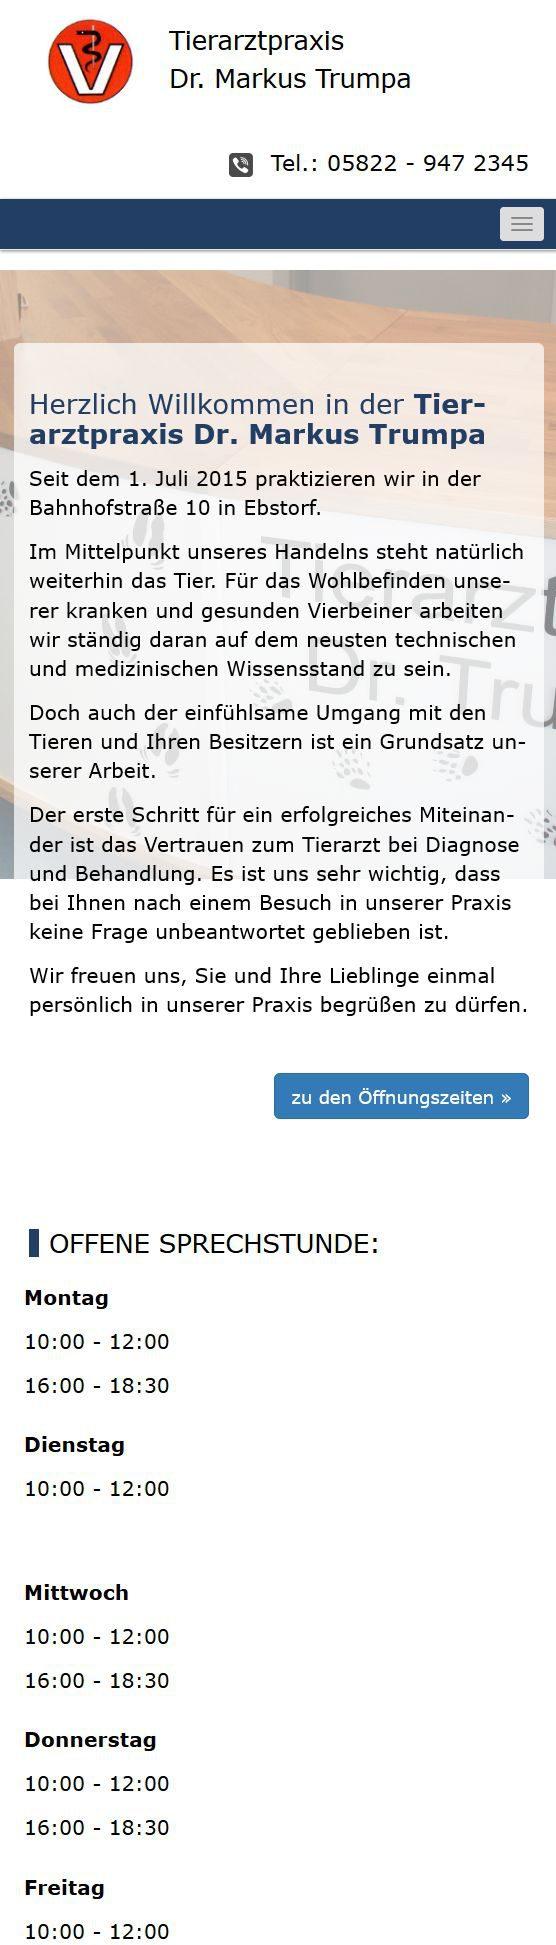 tierarztpraxis-trumpa-internetseite-ebstorf-responsive-mobile